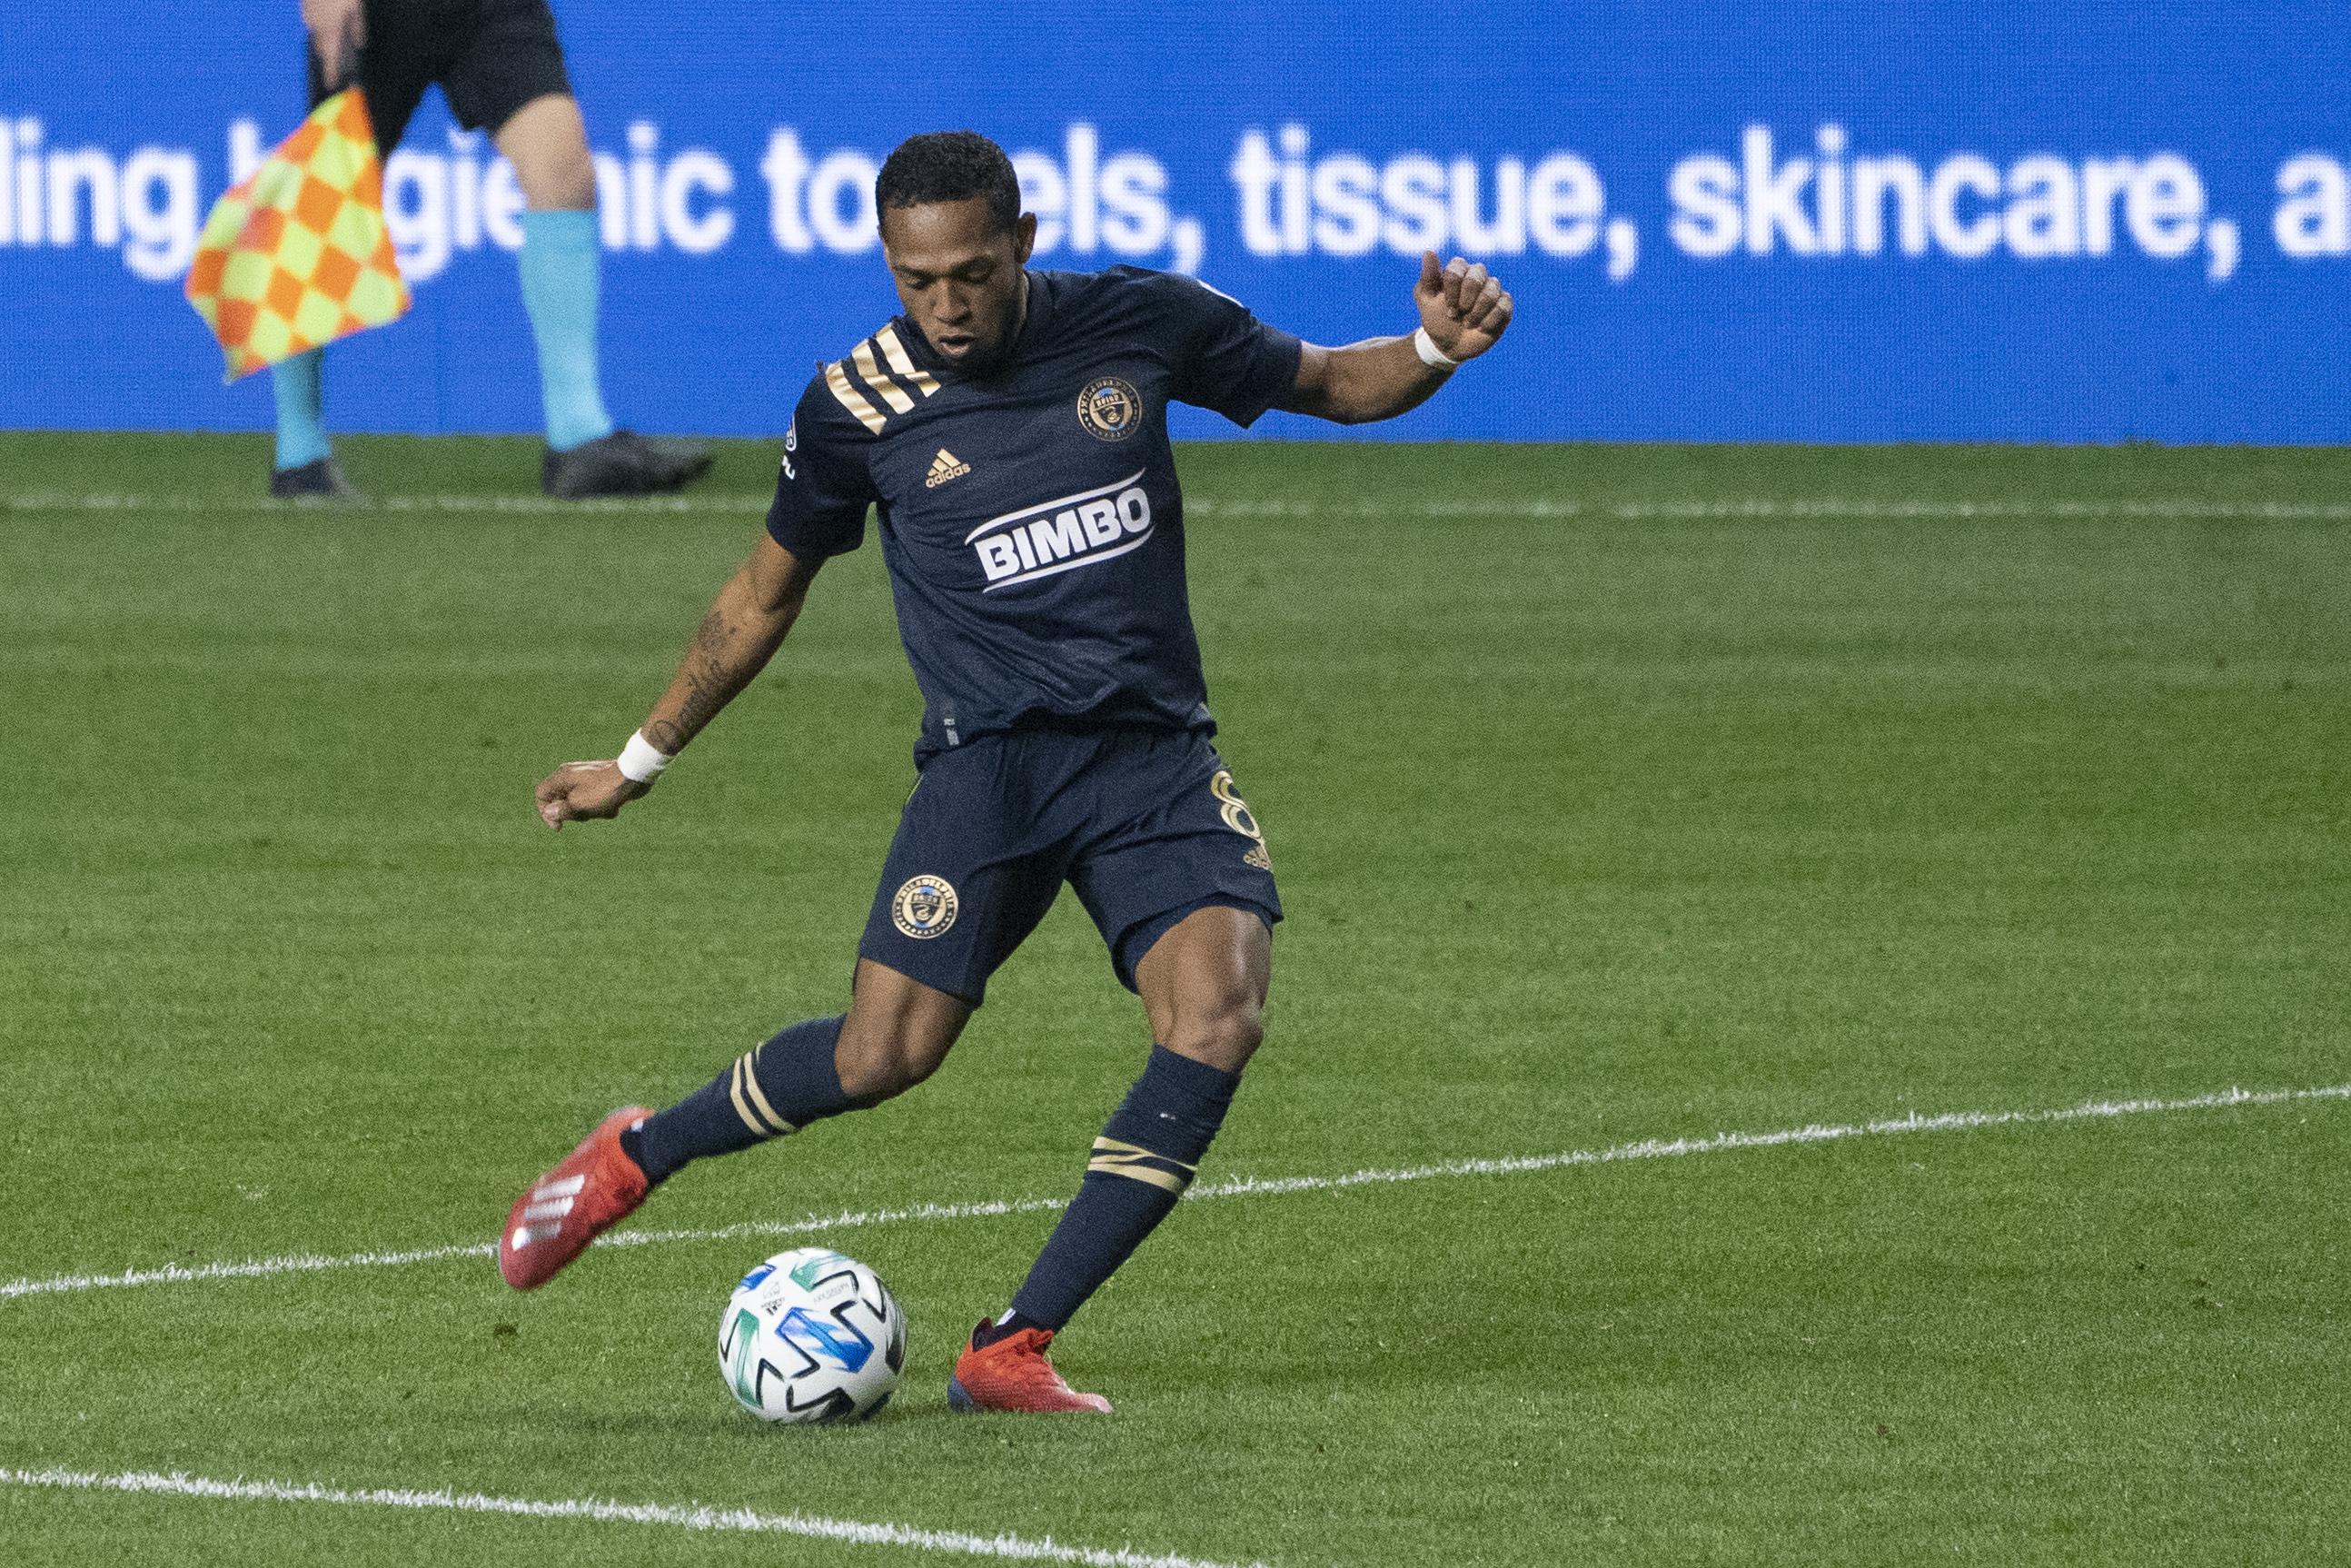 SOCCER: OCT 24 MLS - Toronto FC at Philadelphia Union